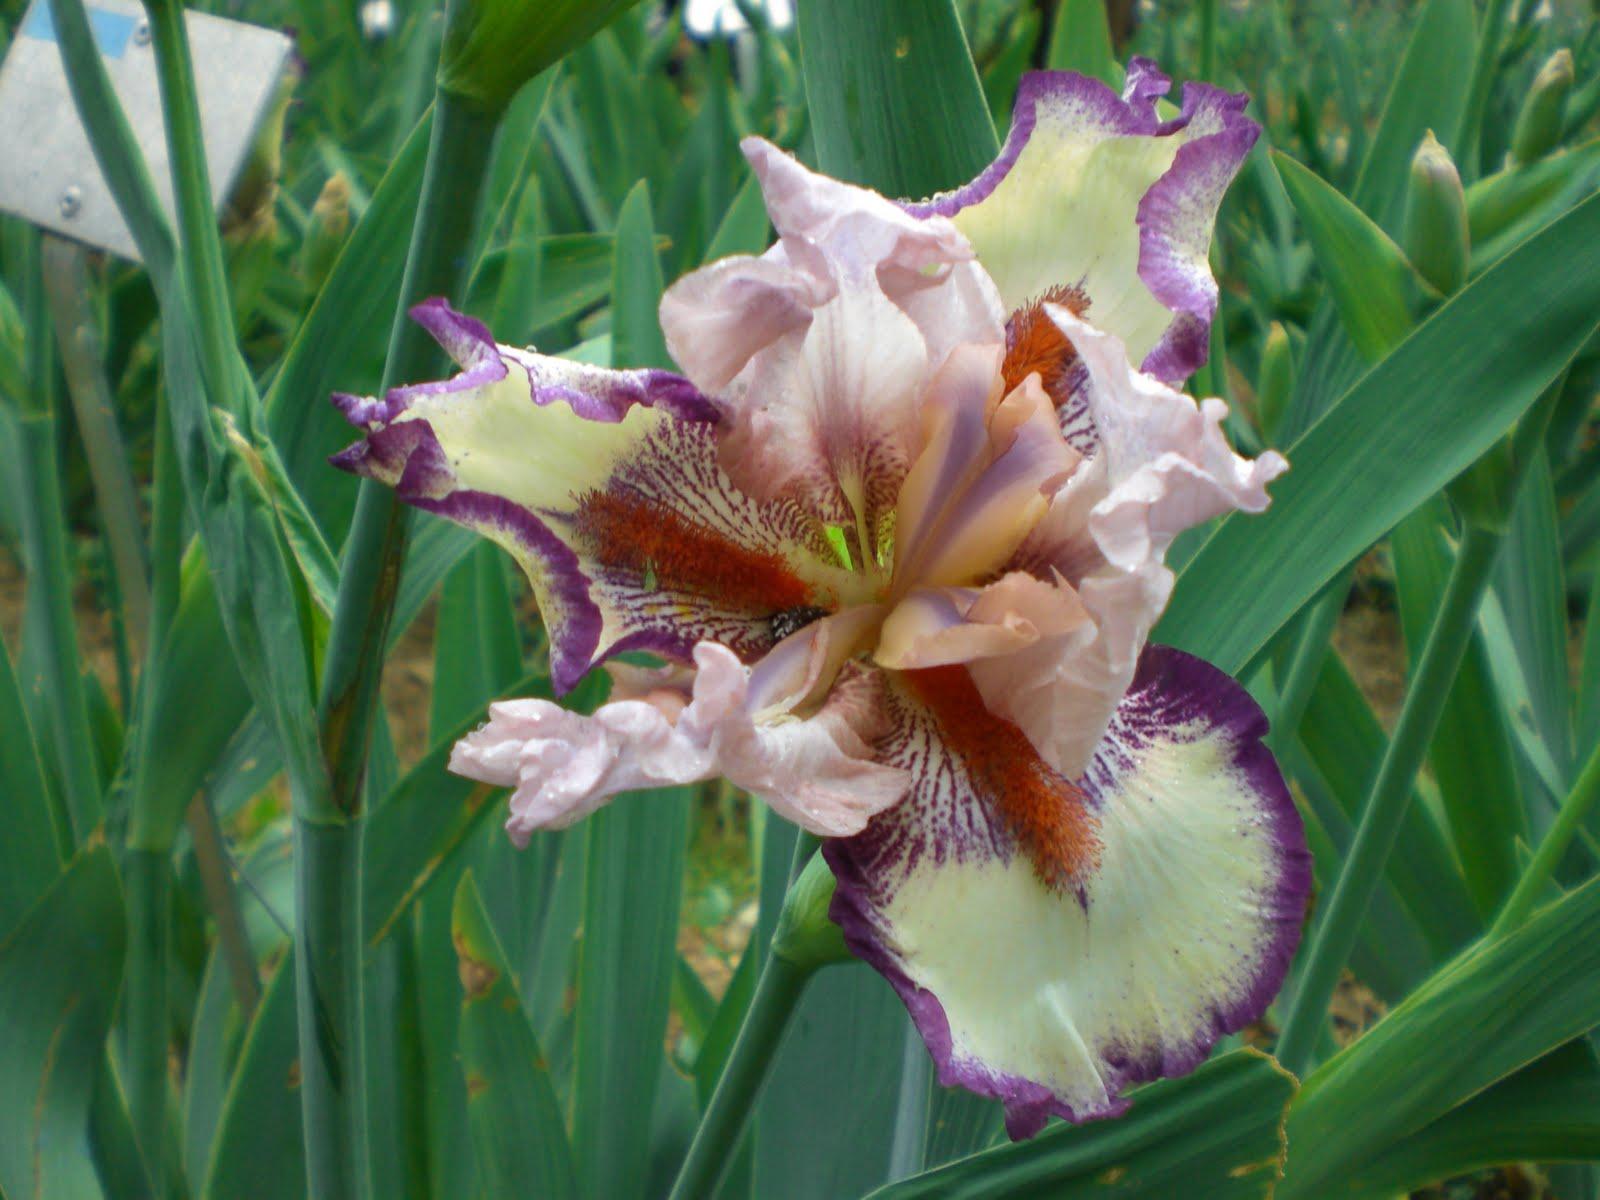 Anna lanzetta aprile 2011 - Giardino dell iris firenze ...